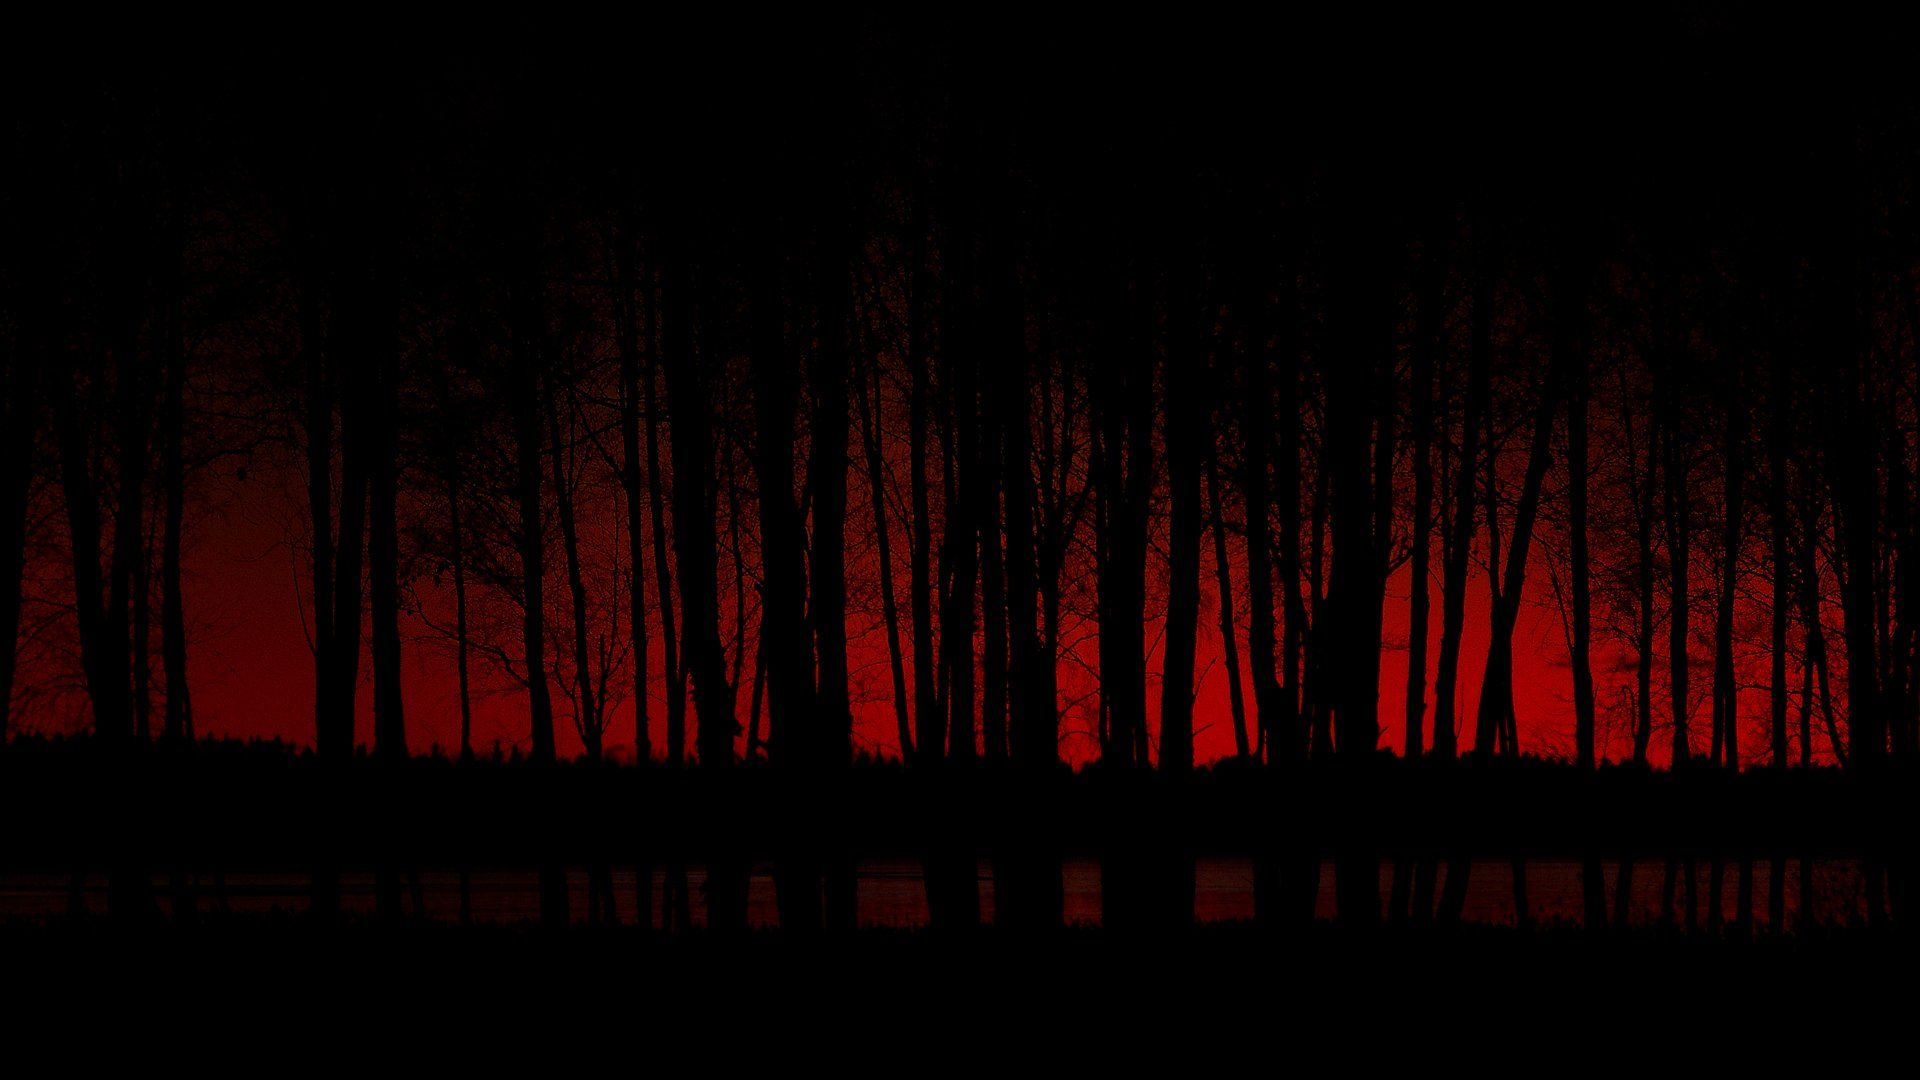 Dark Forest Wallpaper Dark Wallpaper Forest Wallpaper Dark Red Wallpaper